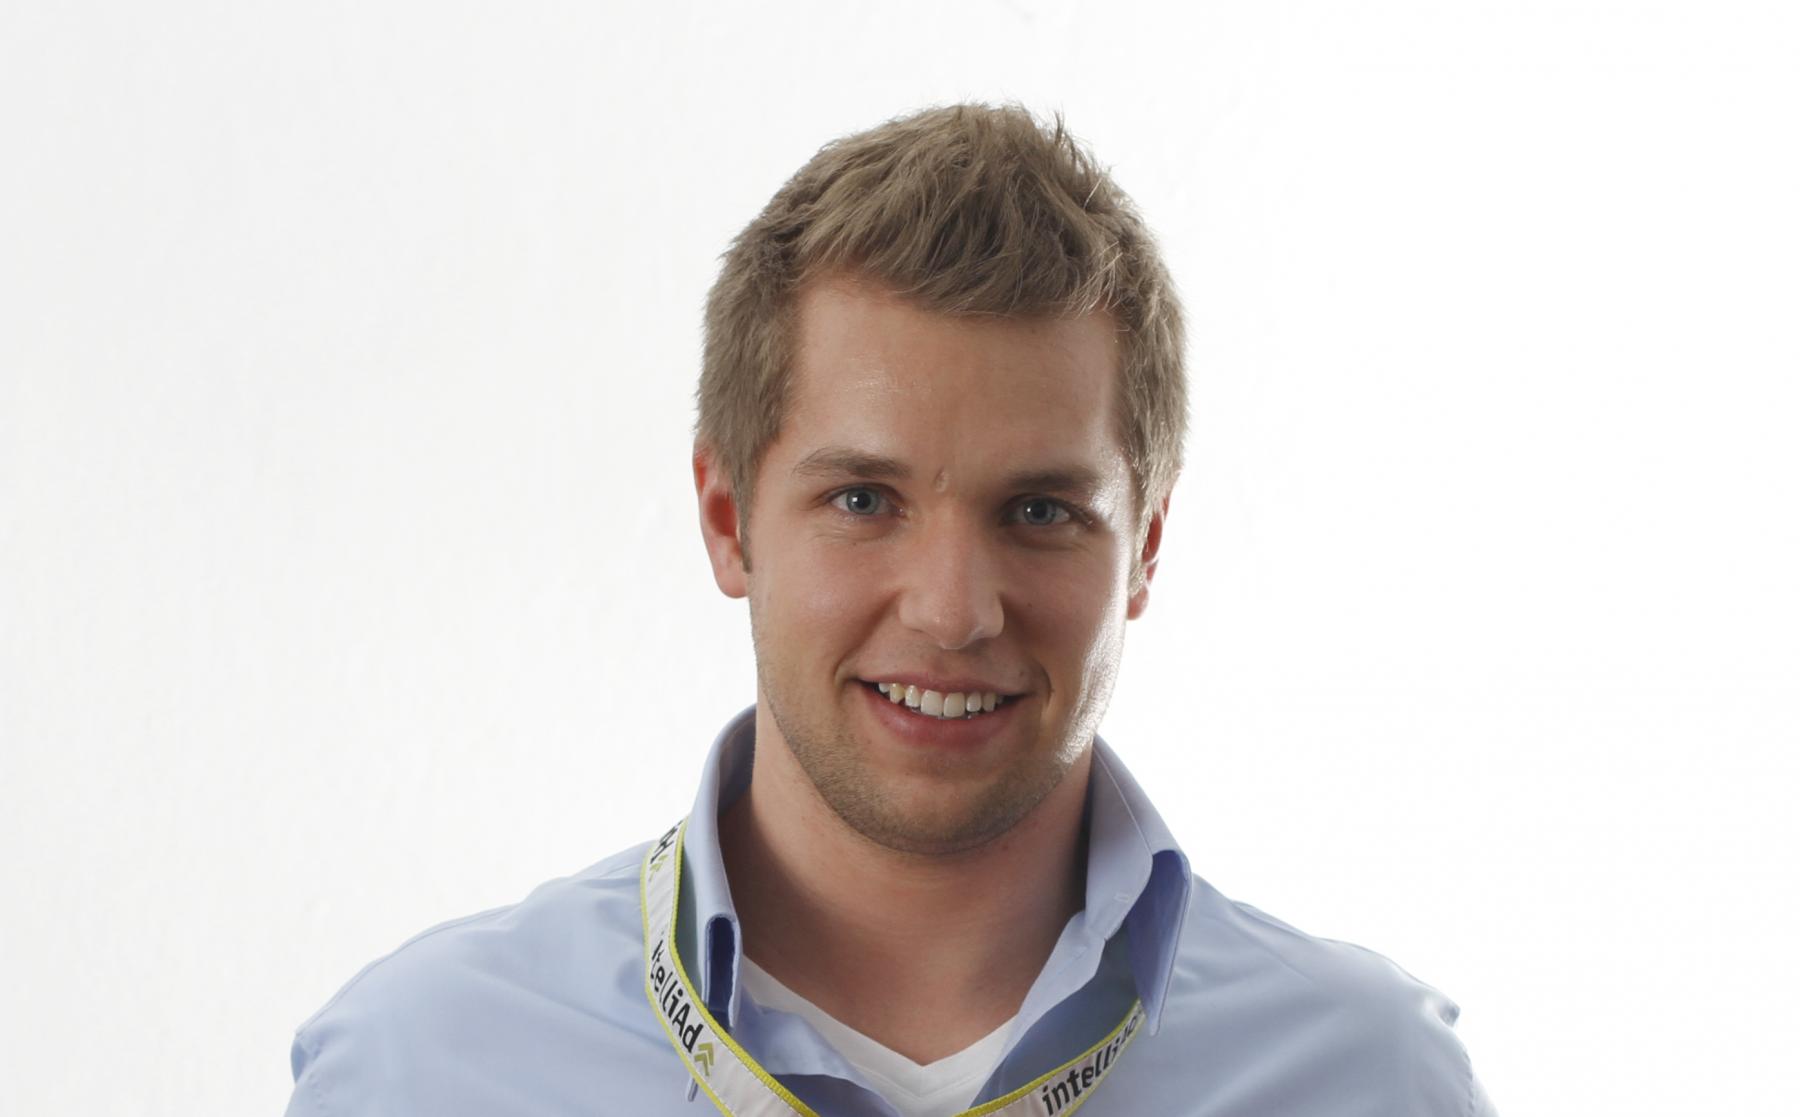 Tobias_Schweighöfer_Product Manager